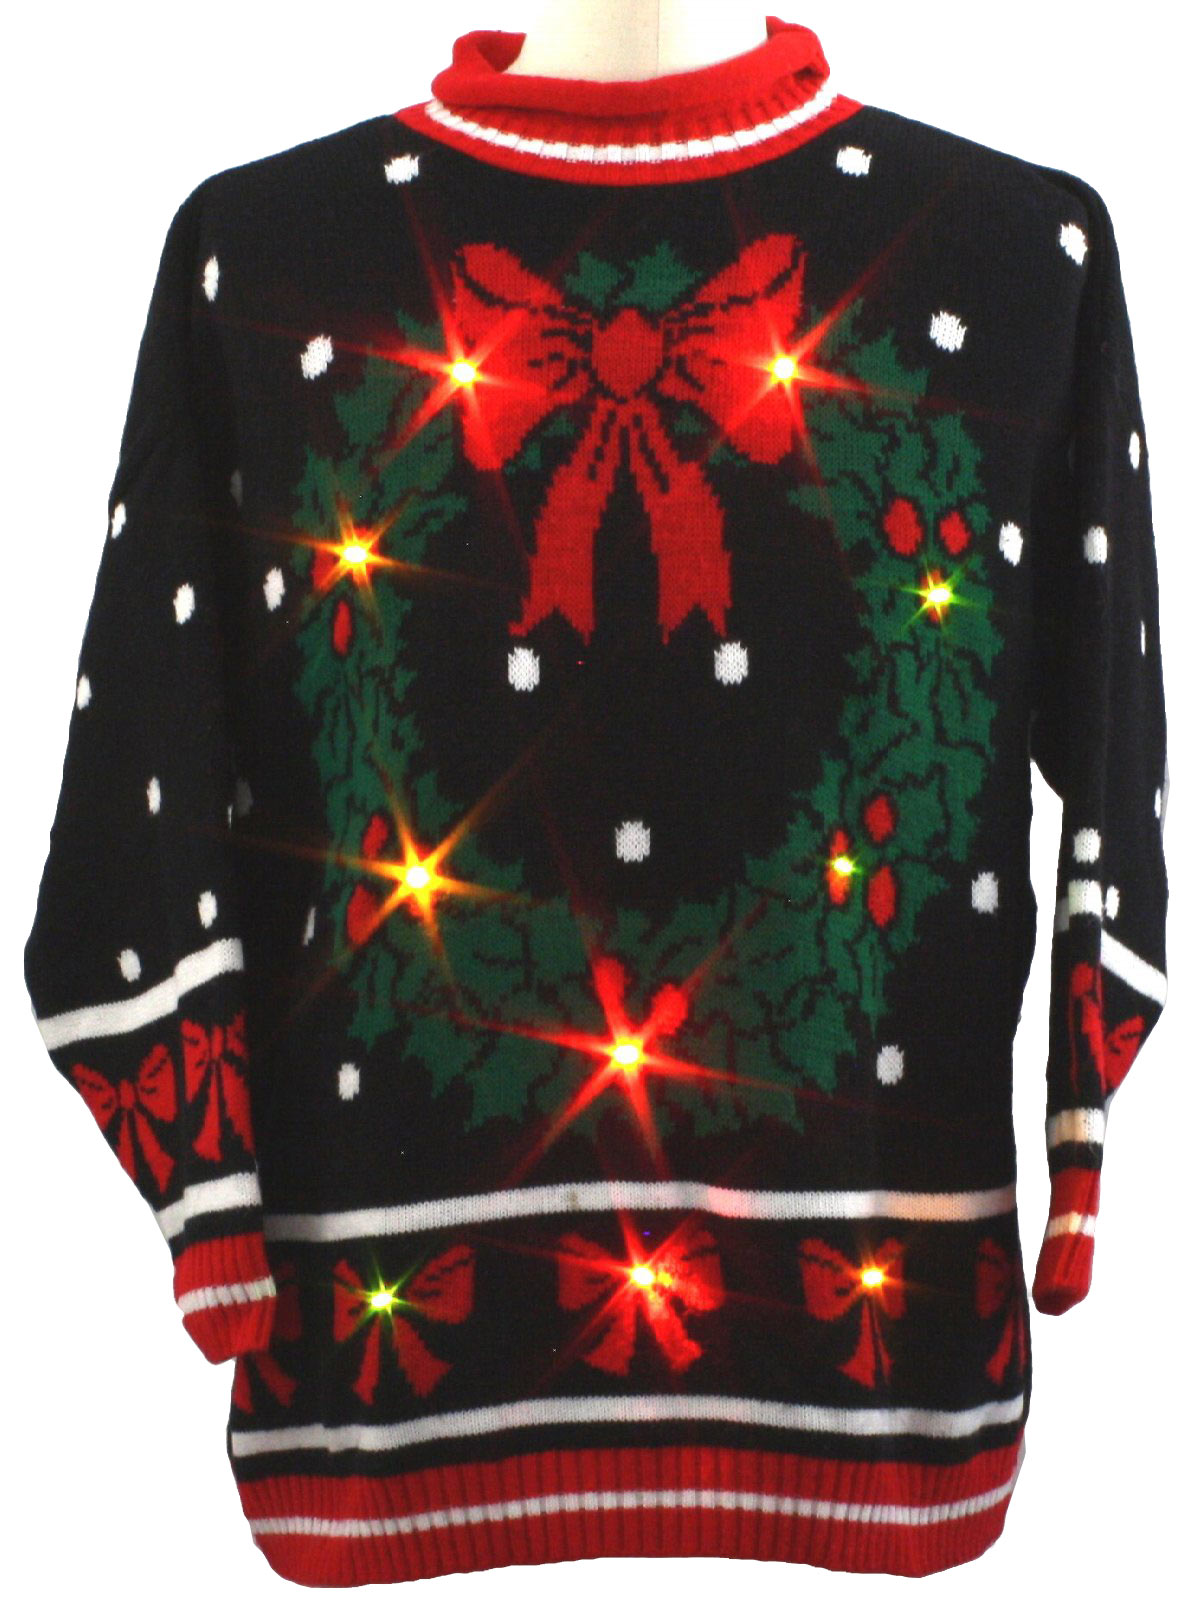 Light Up Sweater